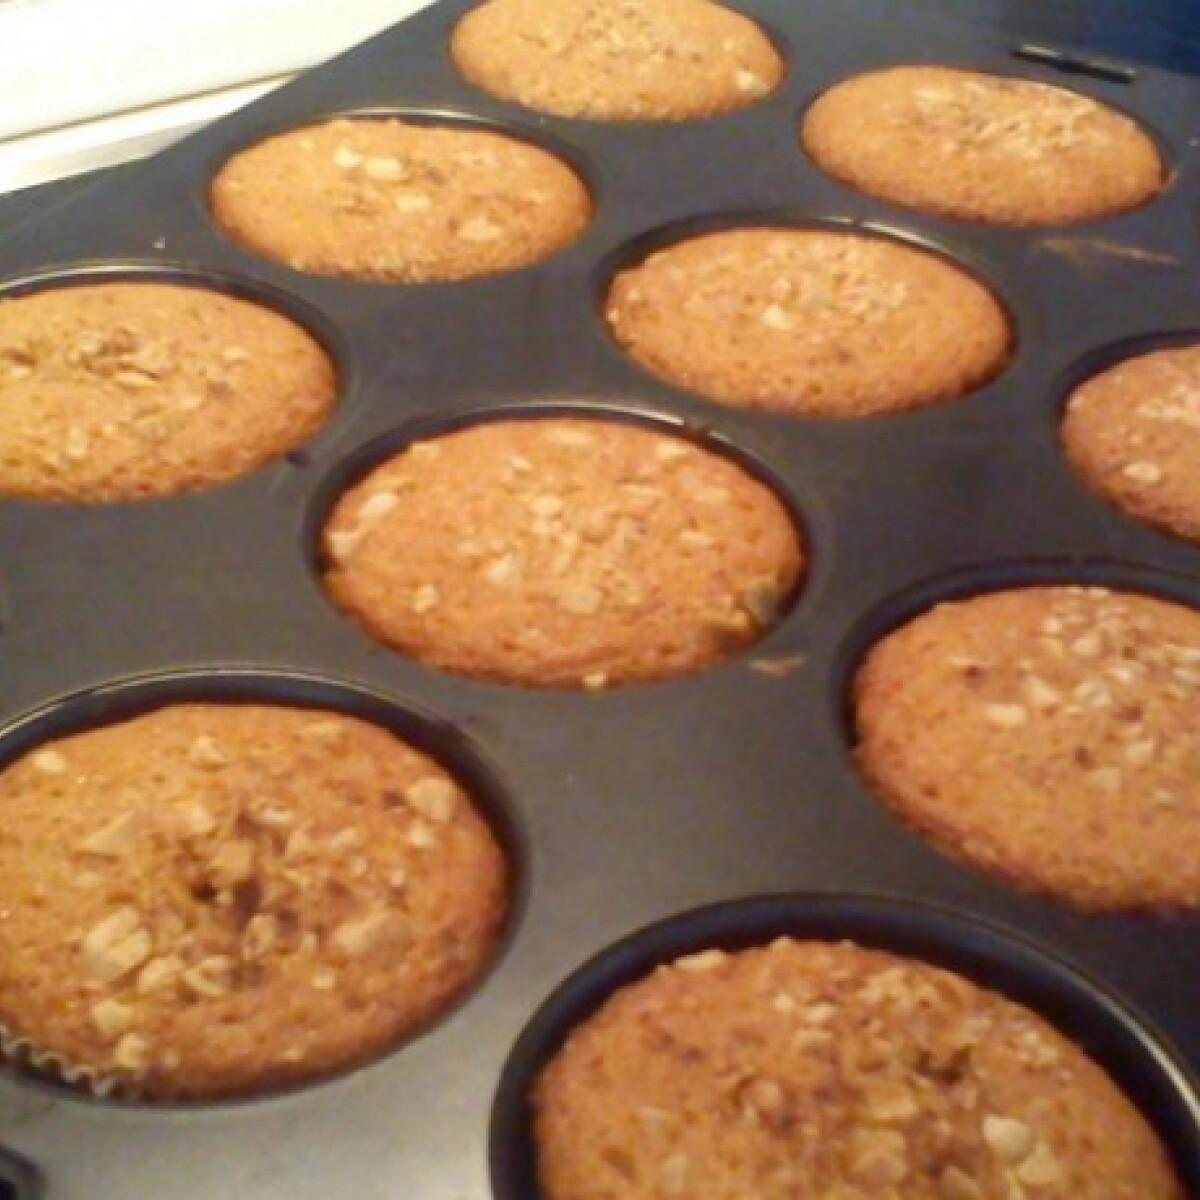 Ezen a képen: Fahéjas-mogyorós muffin vaníliapudinggal